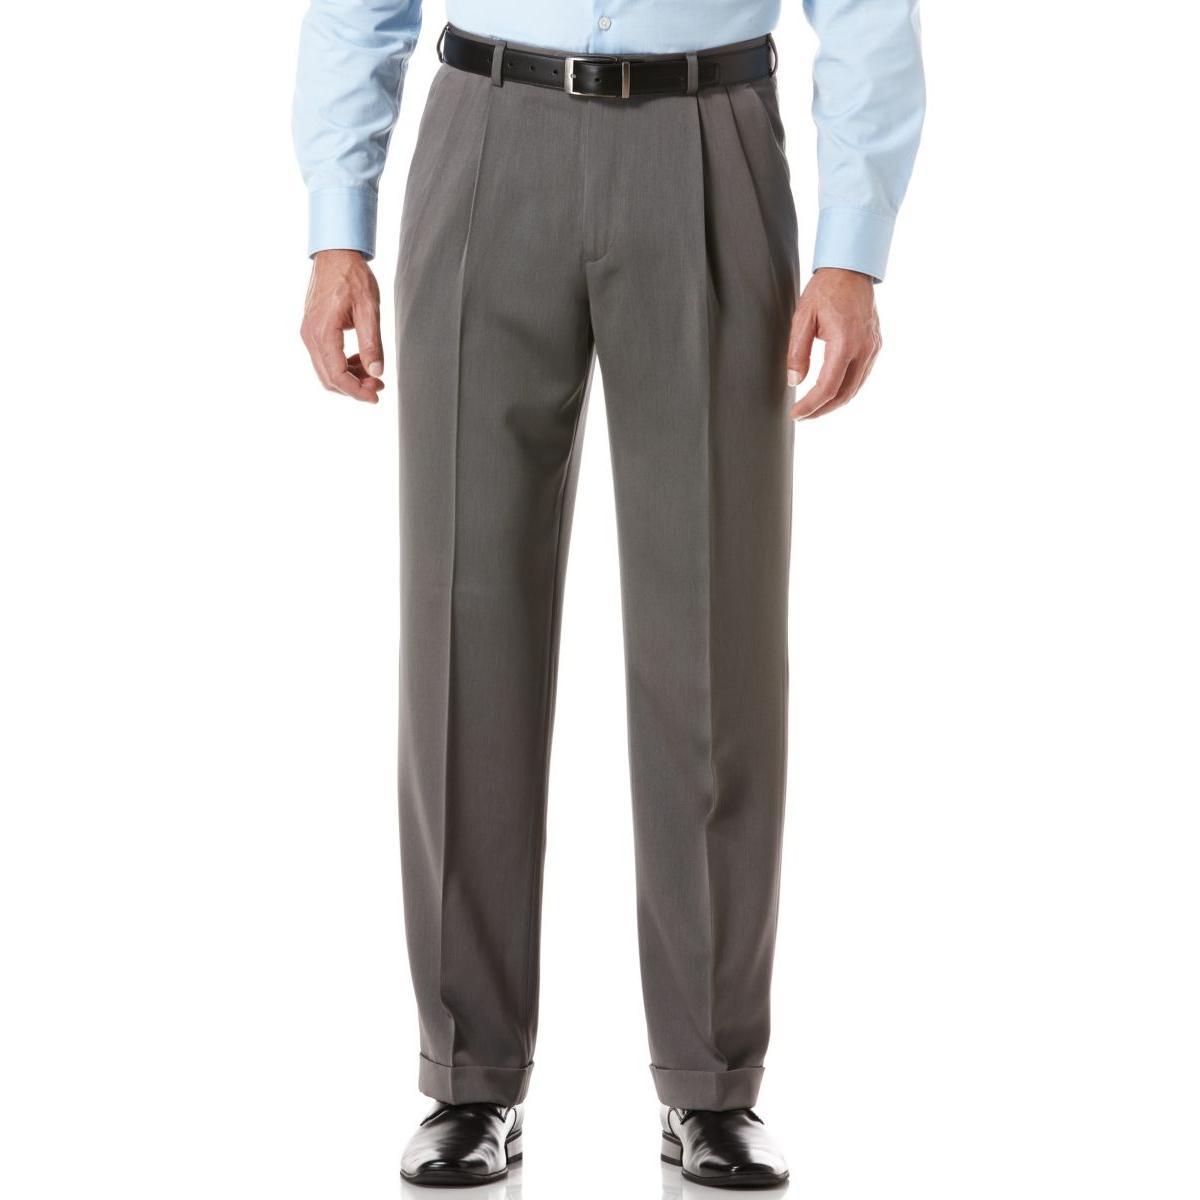 Perry-Ellis-Mens-Micro-Melange-Classic-Fit-Dress-Pants-Trousers-BHFO-5828